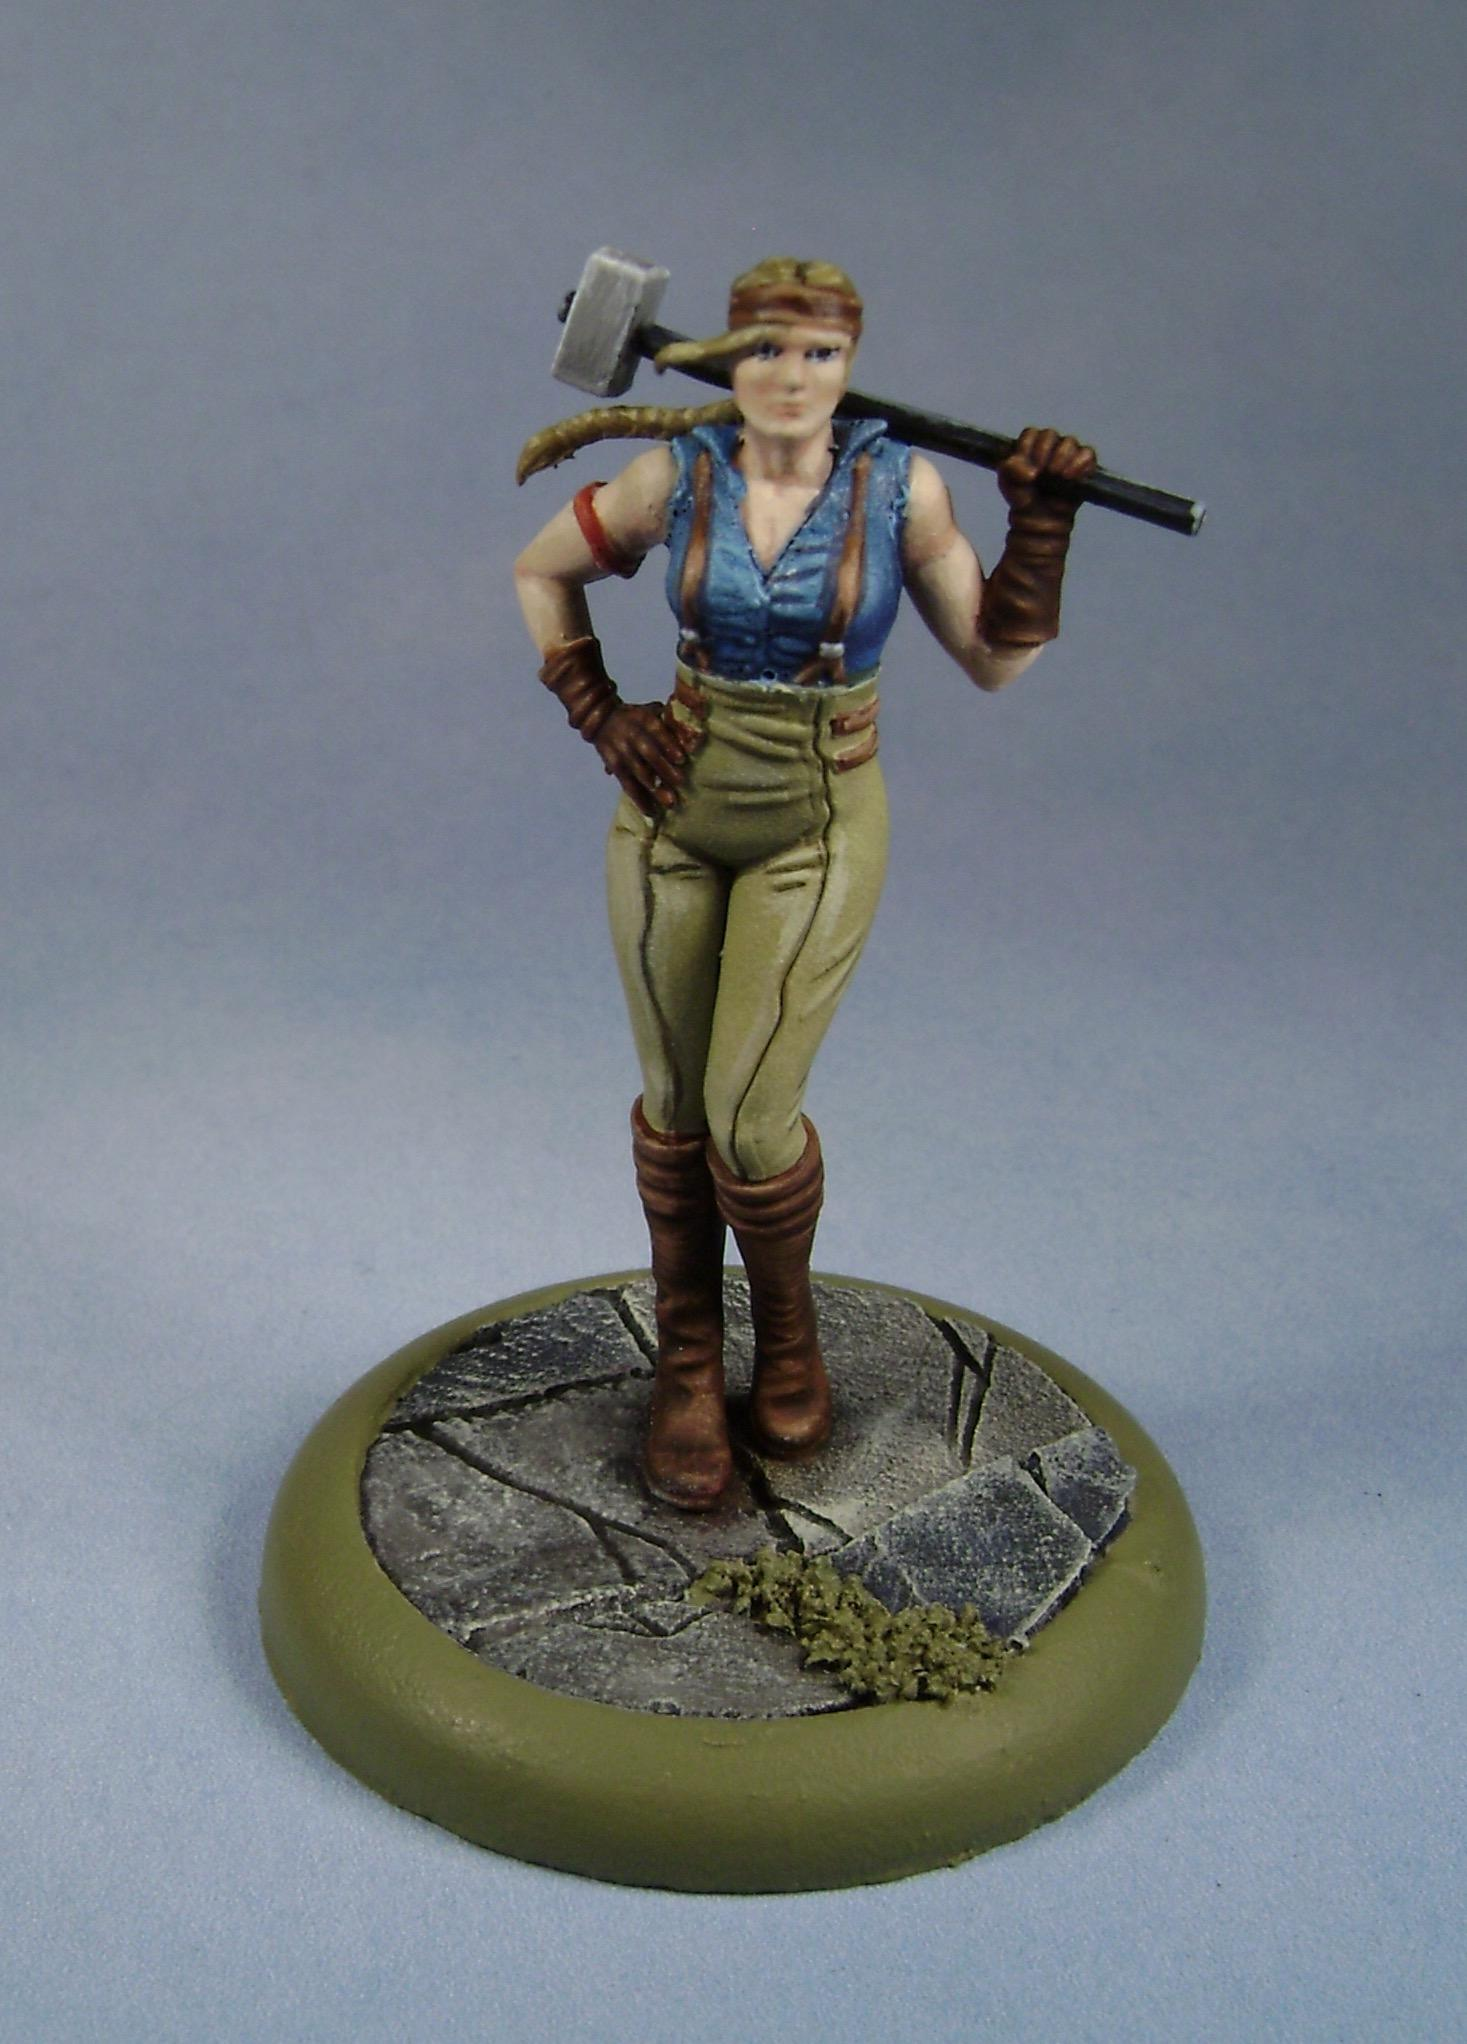 Johana, M&su, Malifaux, Miniatures, Models, Non-Metallic Metal, Outcasts, Painted